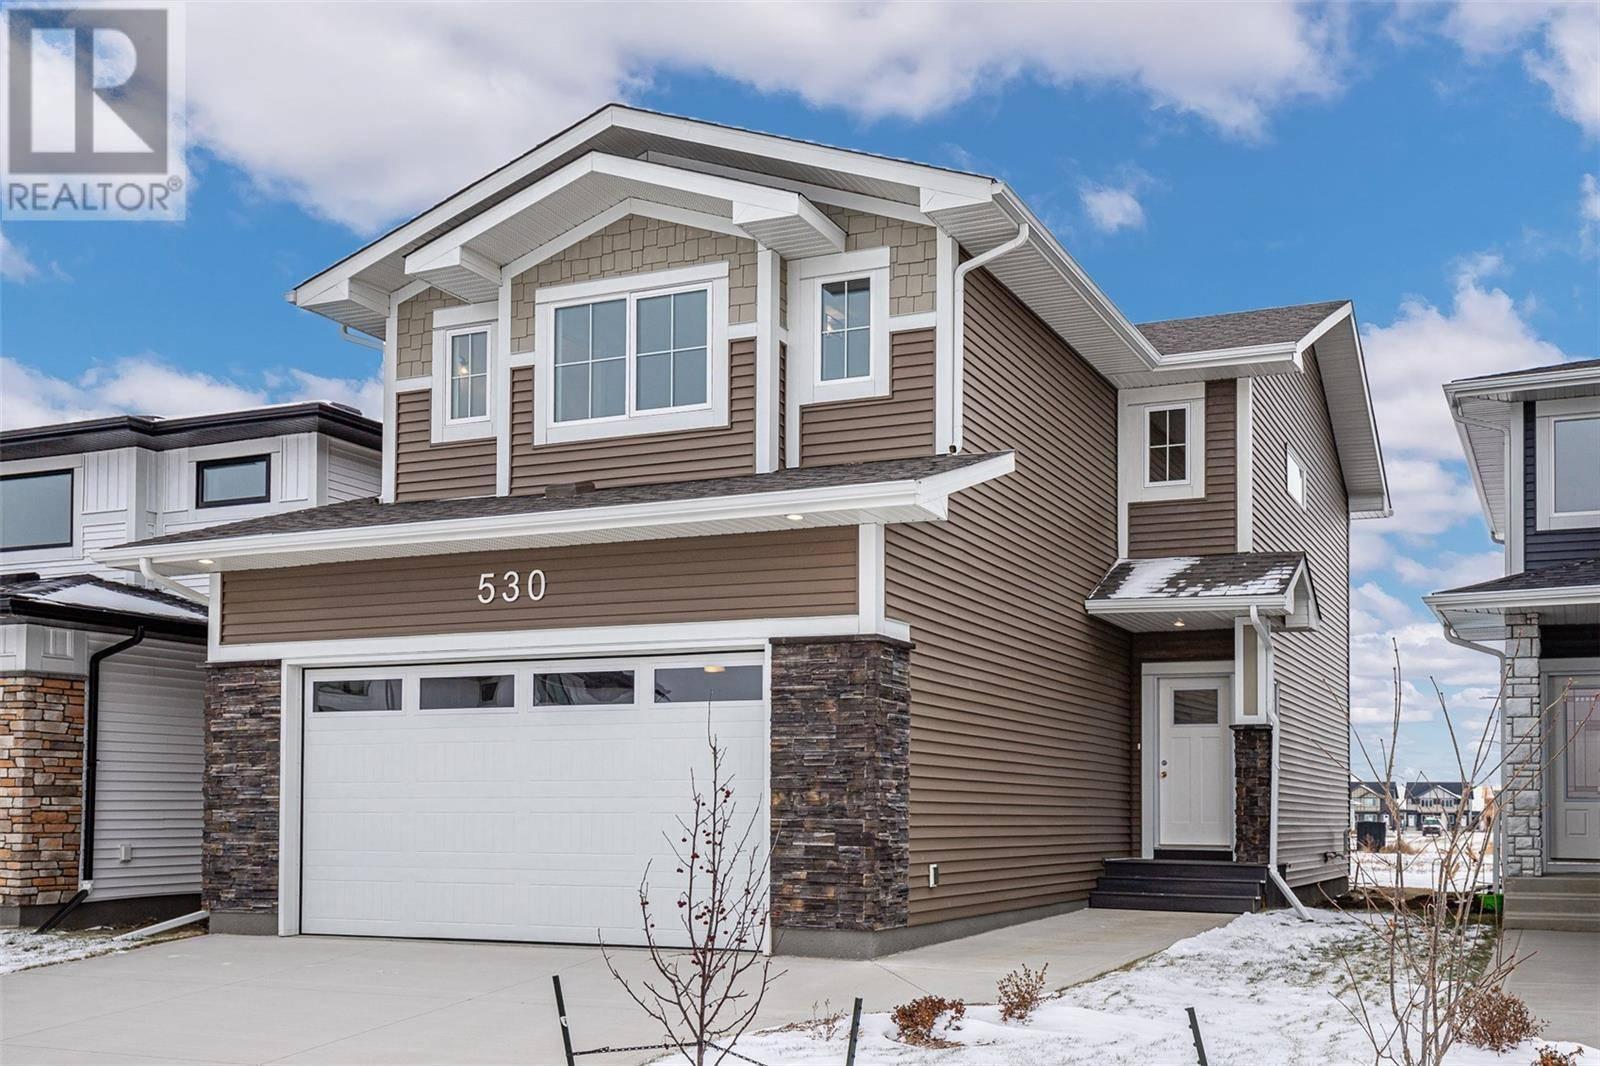 House for sale at 530 Germain Wy Saskatoon Saskatchewan - MLS: SK792607